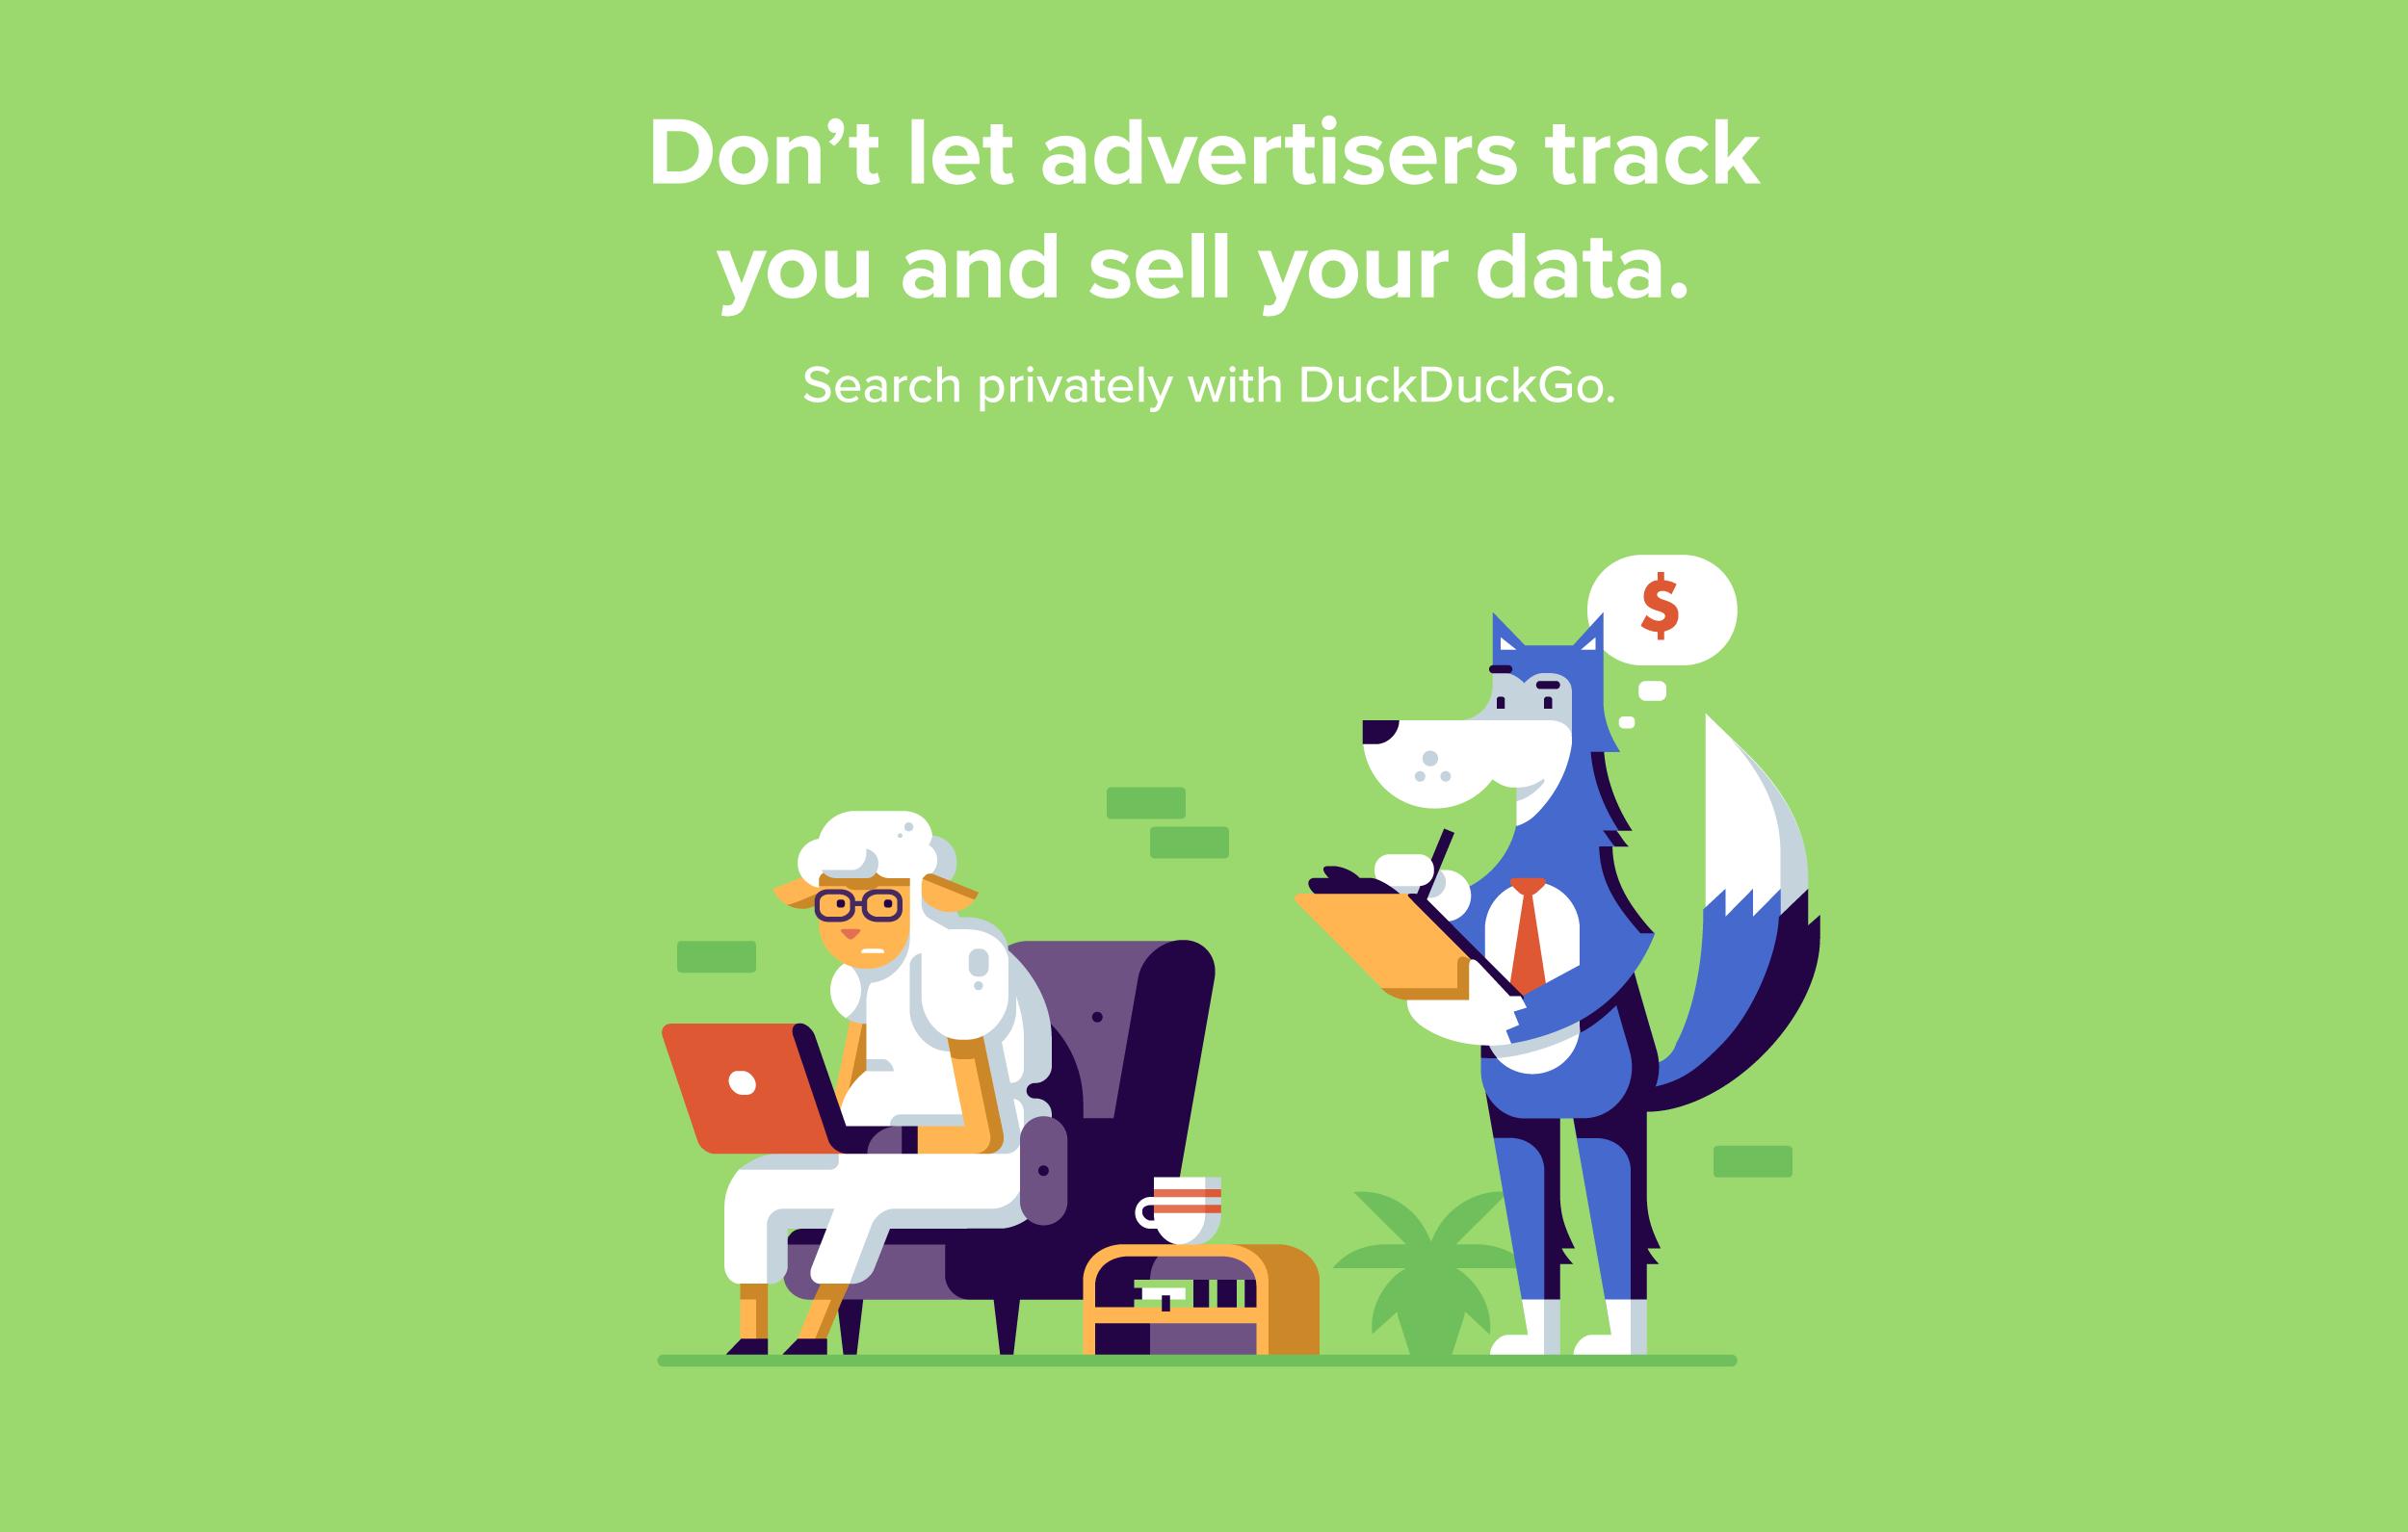 Matt Anderson DuckDuckGo character scenes. Wolf advertiser creeps on sheep internet user.